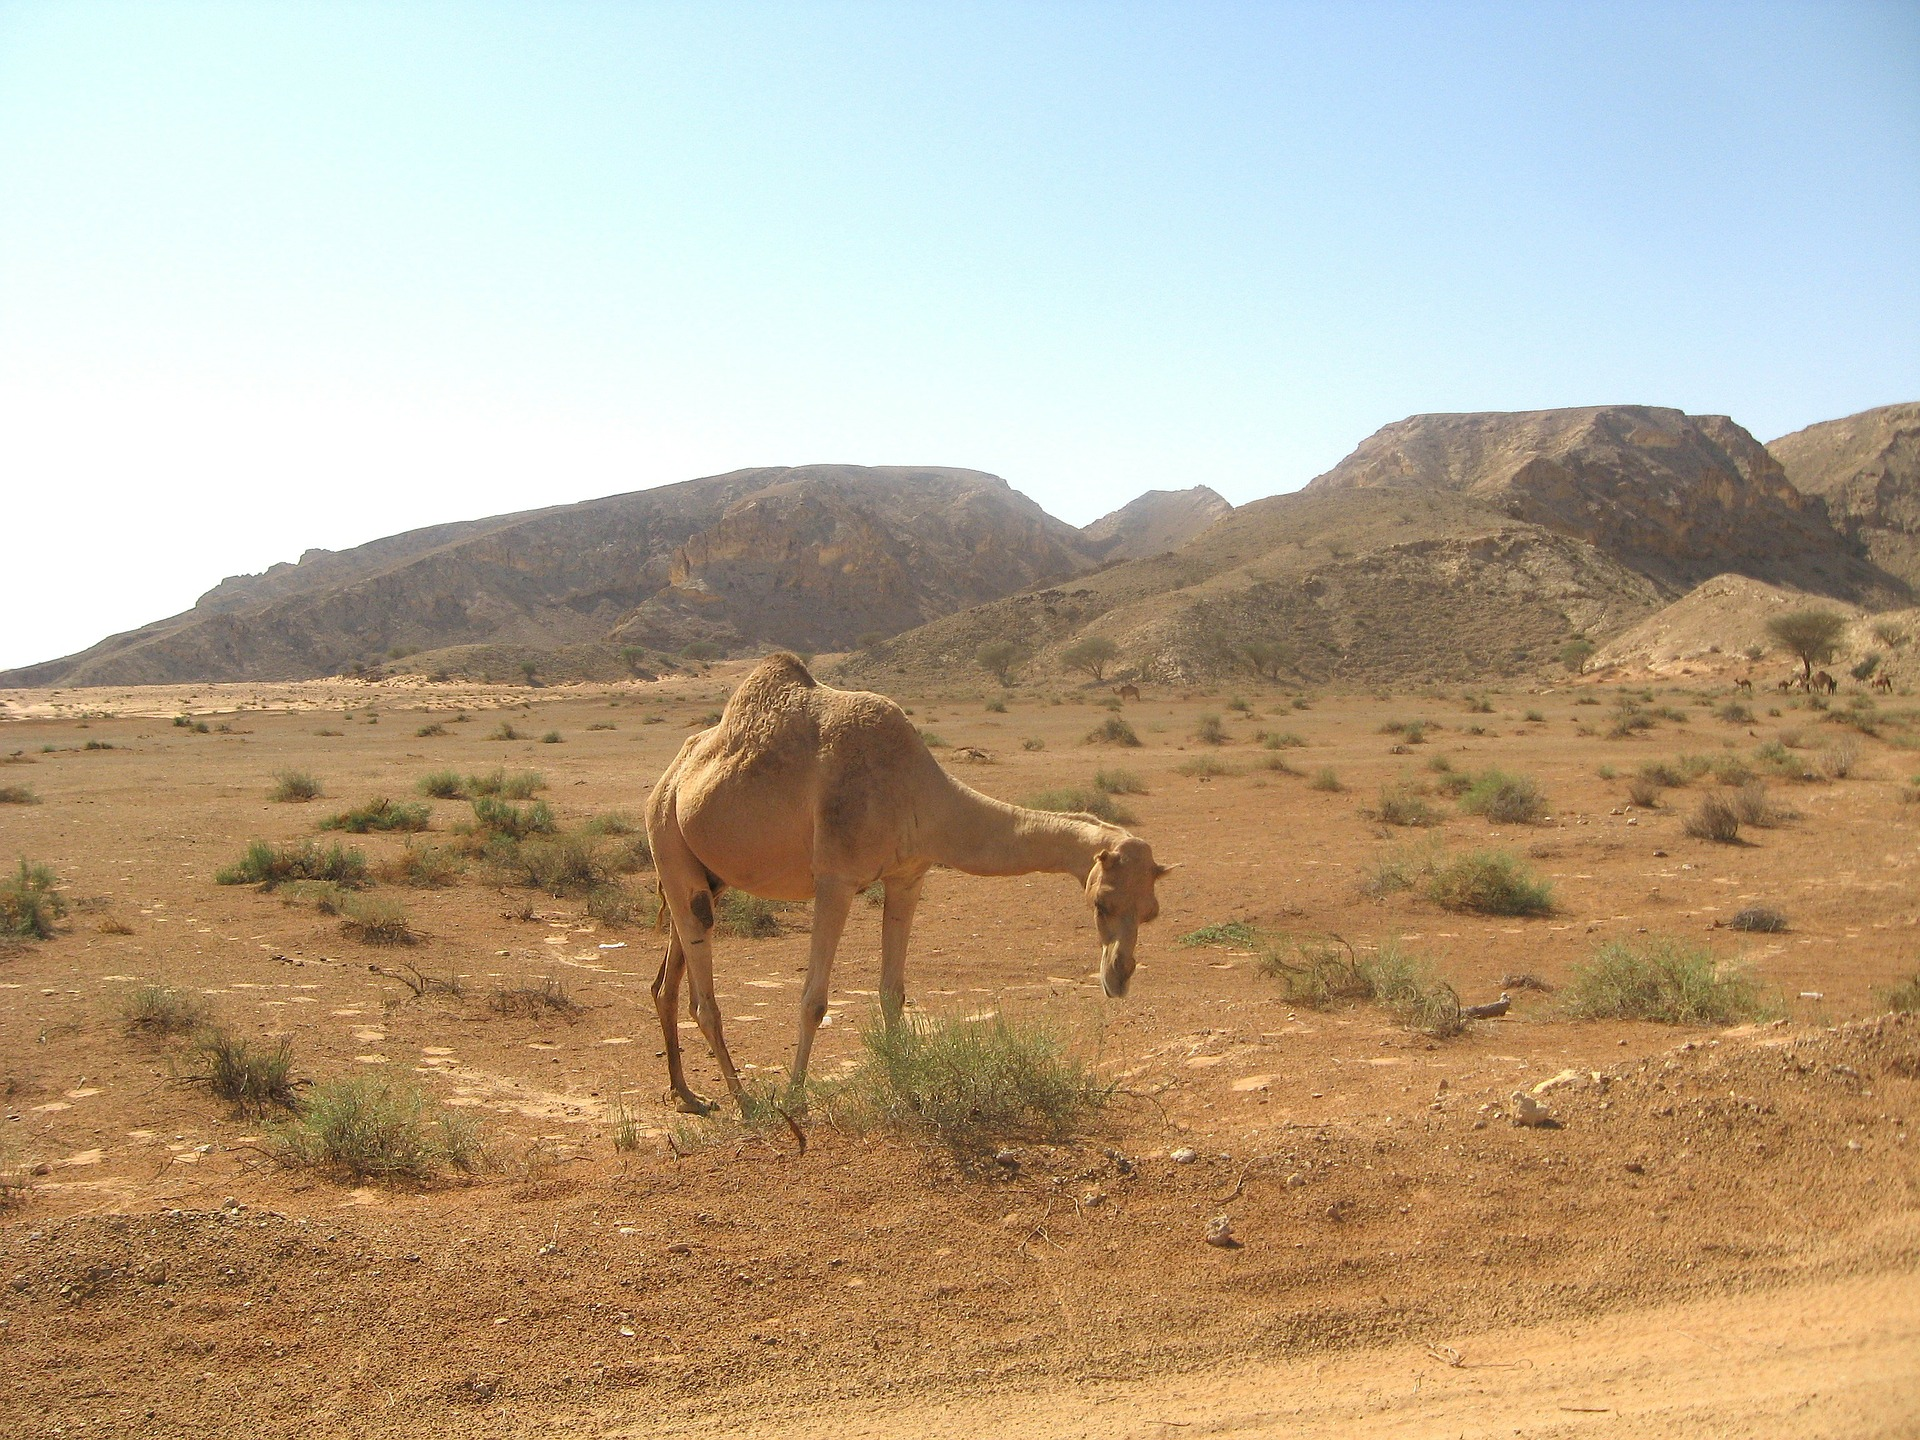 Kamele - während des Urlaub in Dubai